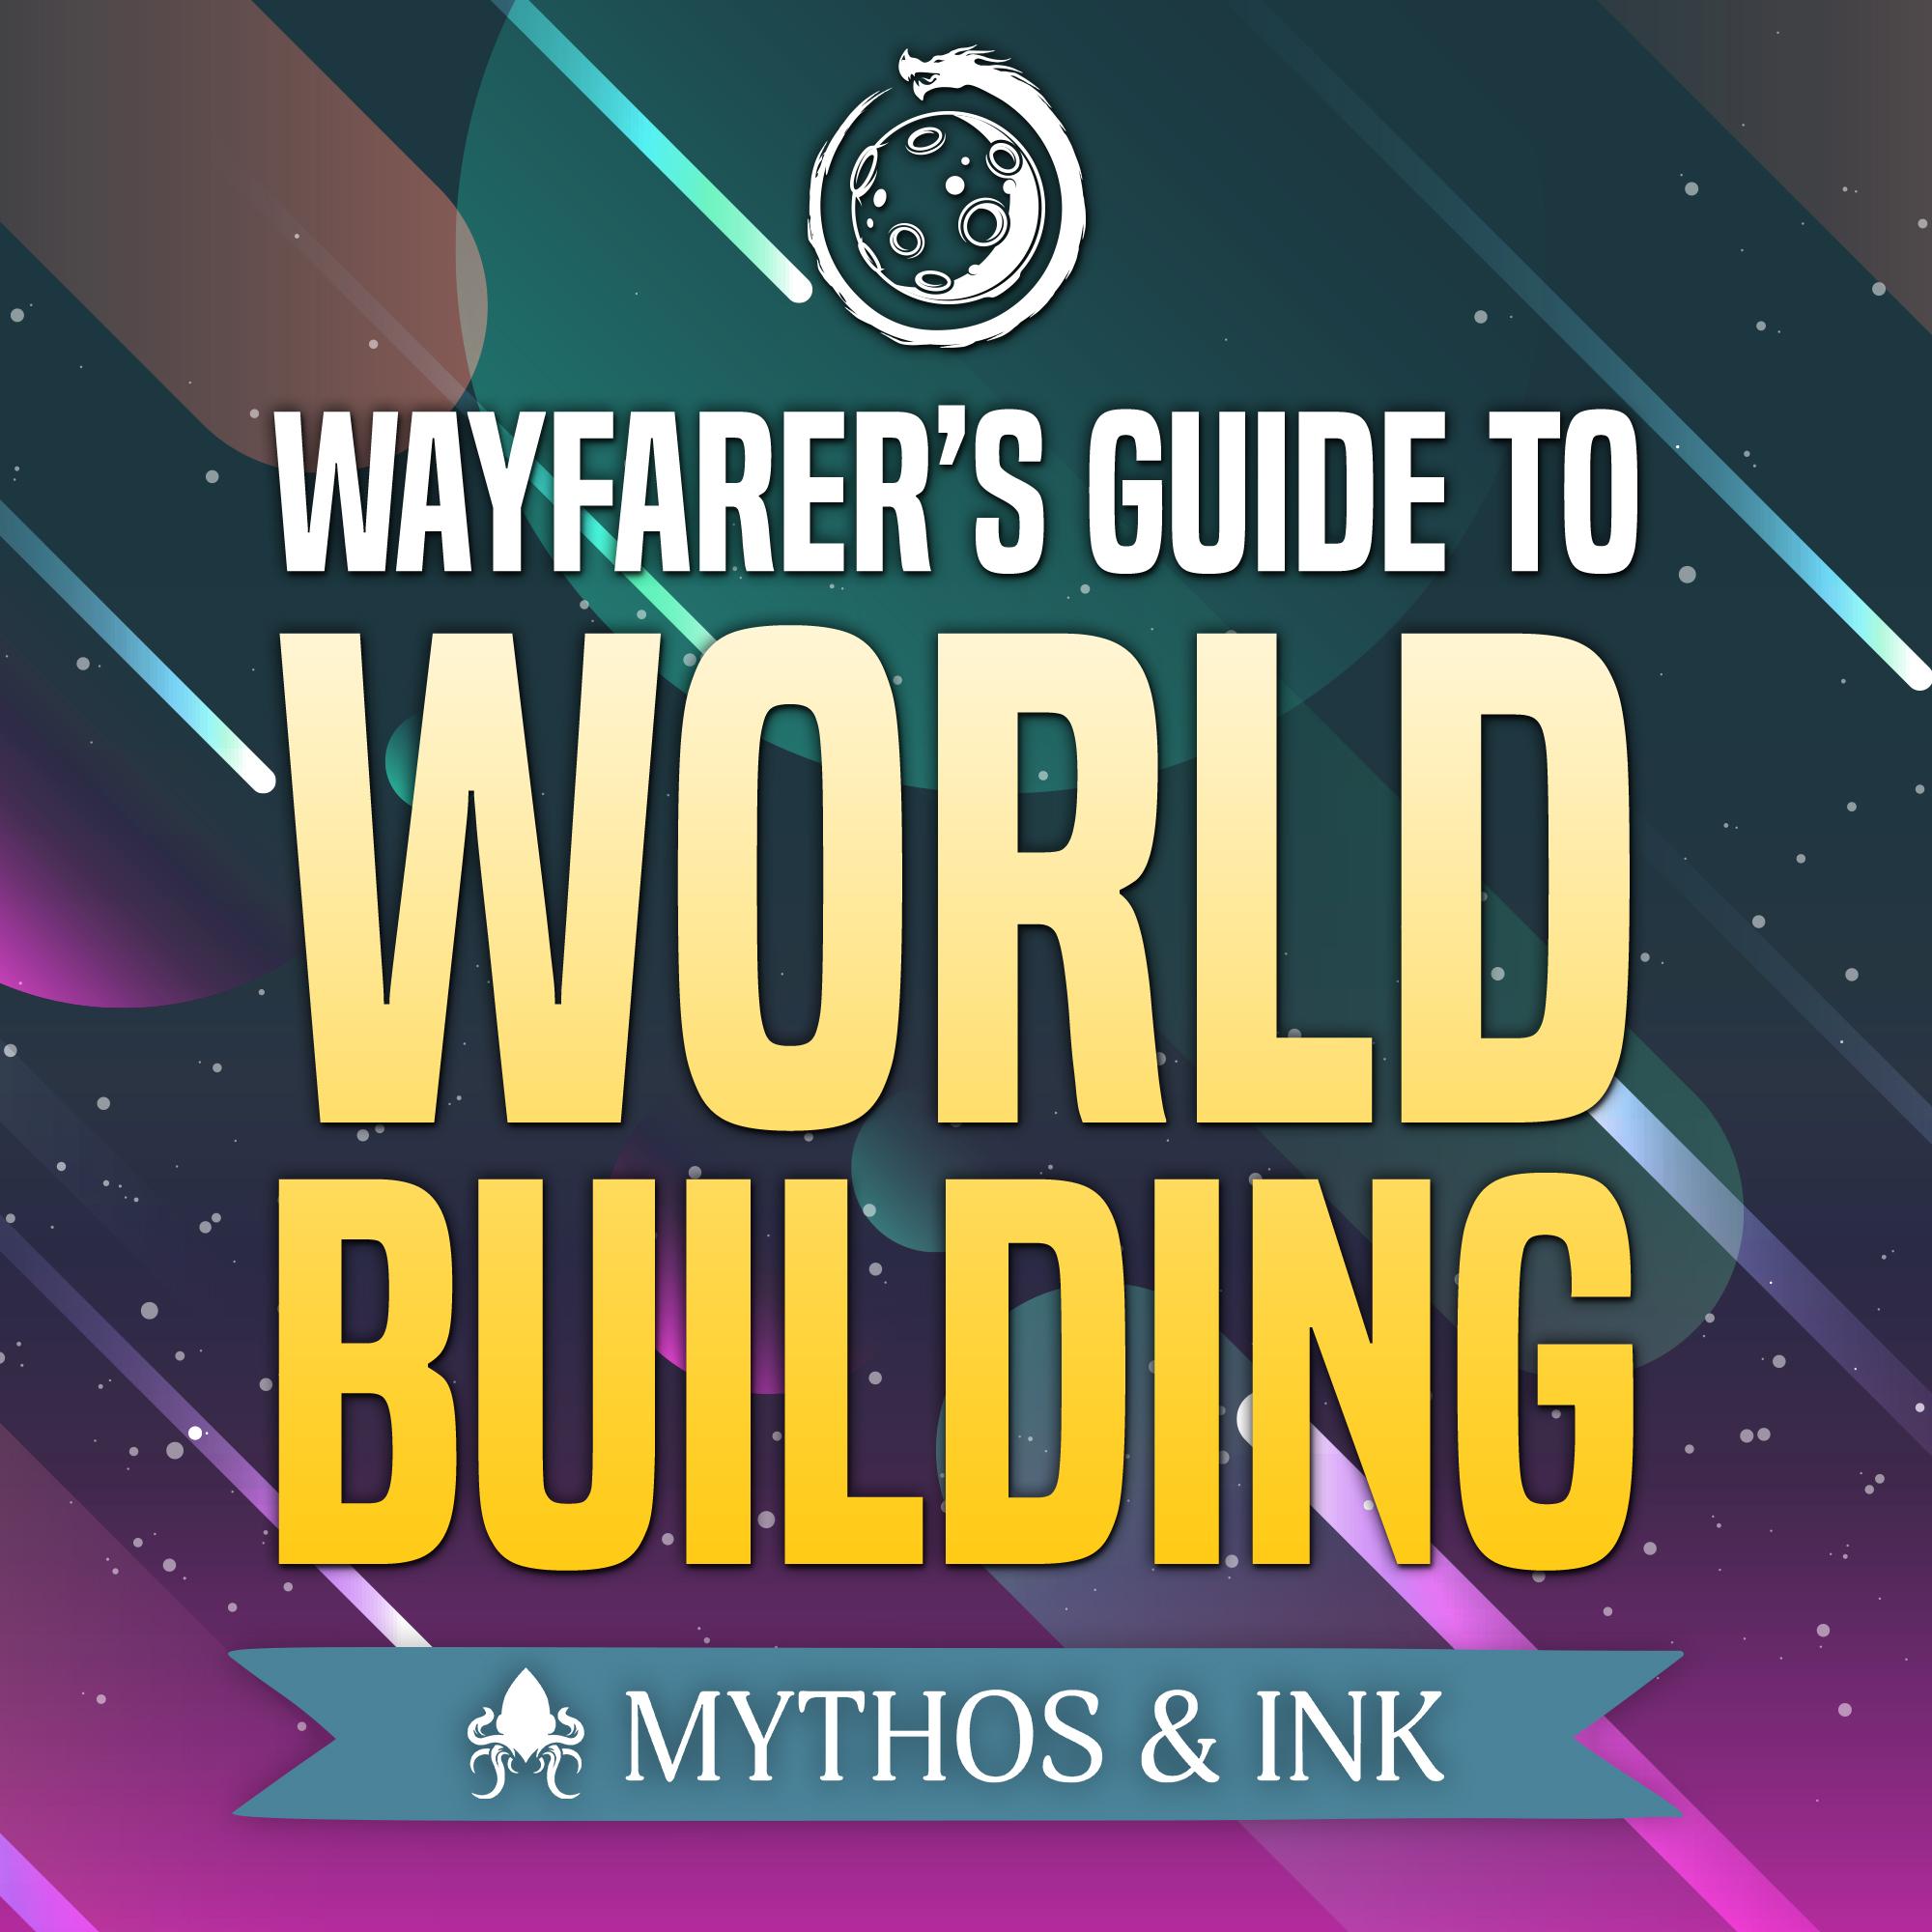 The Wayfarer's Guide to Worldbuilding